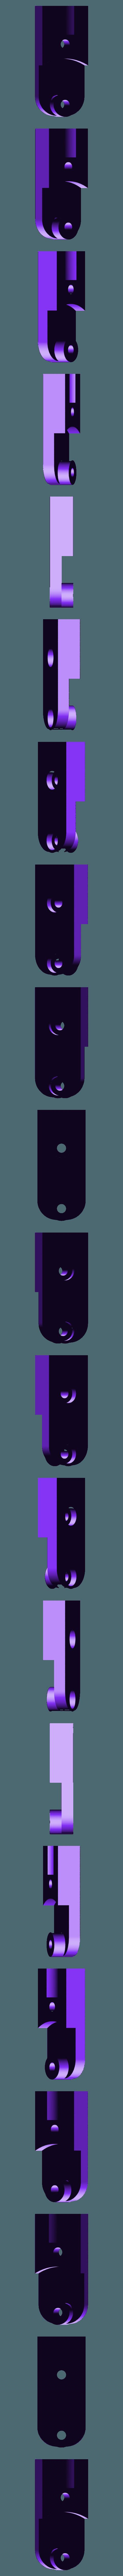 filament_pressure_bar_part2.stl Download free STL file Geared Extruder 2 • Design to 3D print, Job